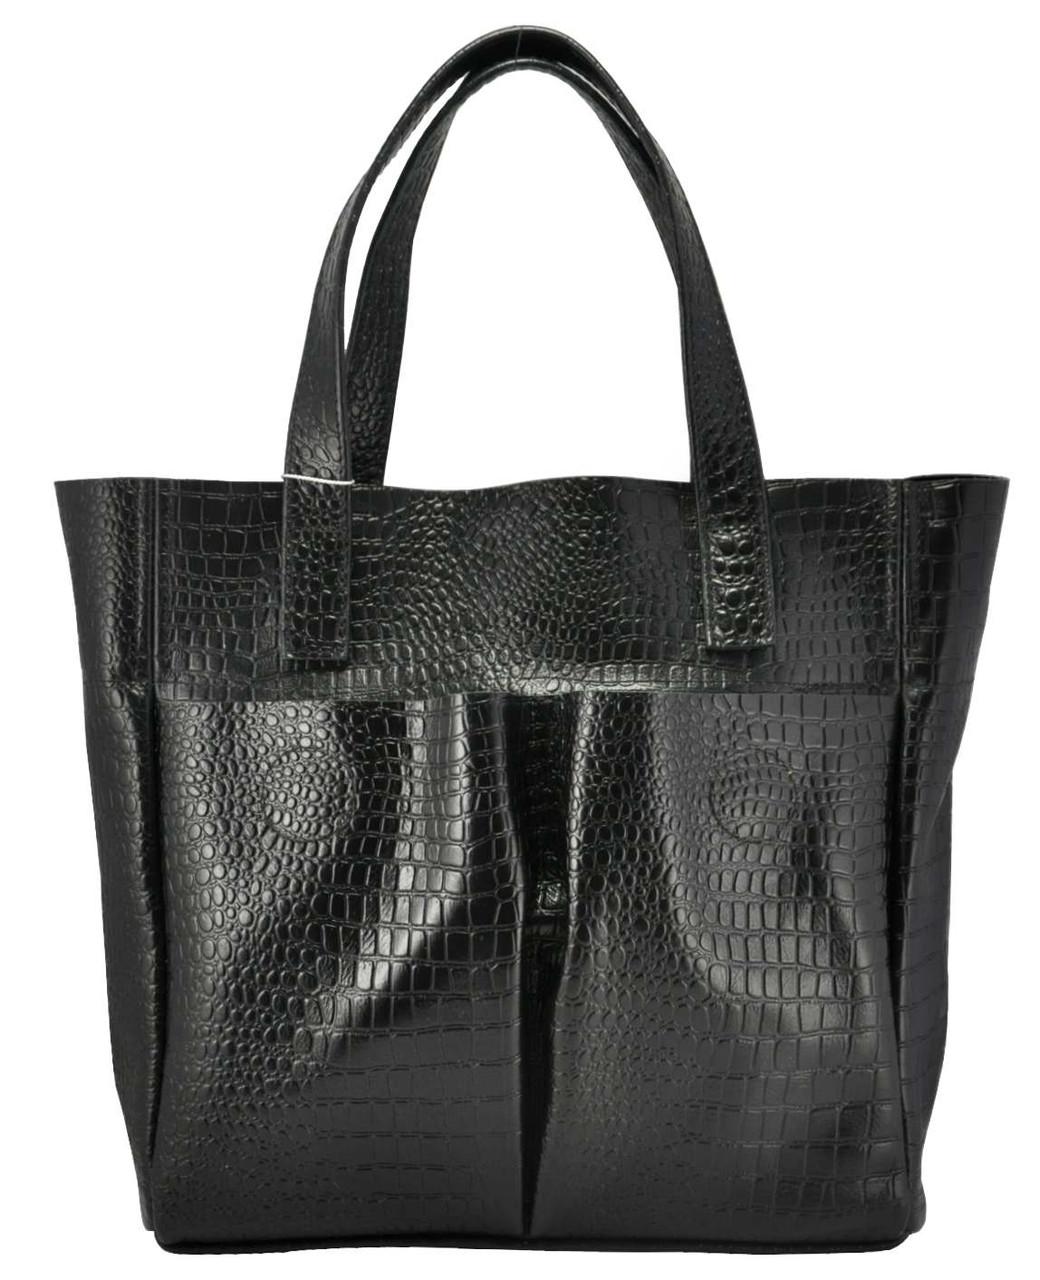 8f076b6e2e7d Женская кожаная сумка с карманами Crocodile черная - Интернет магазин